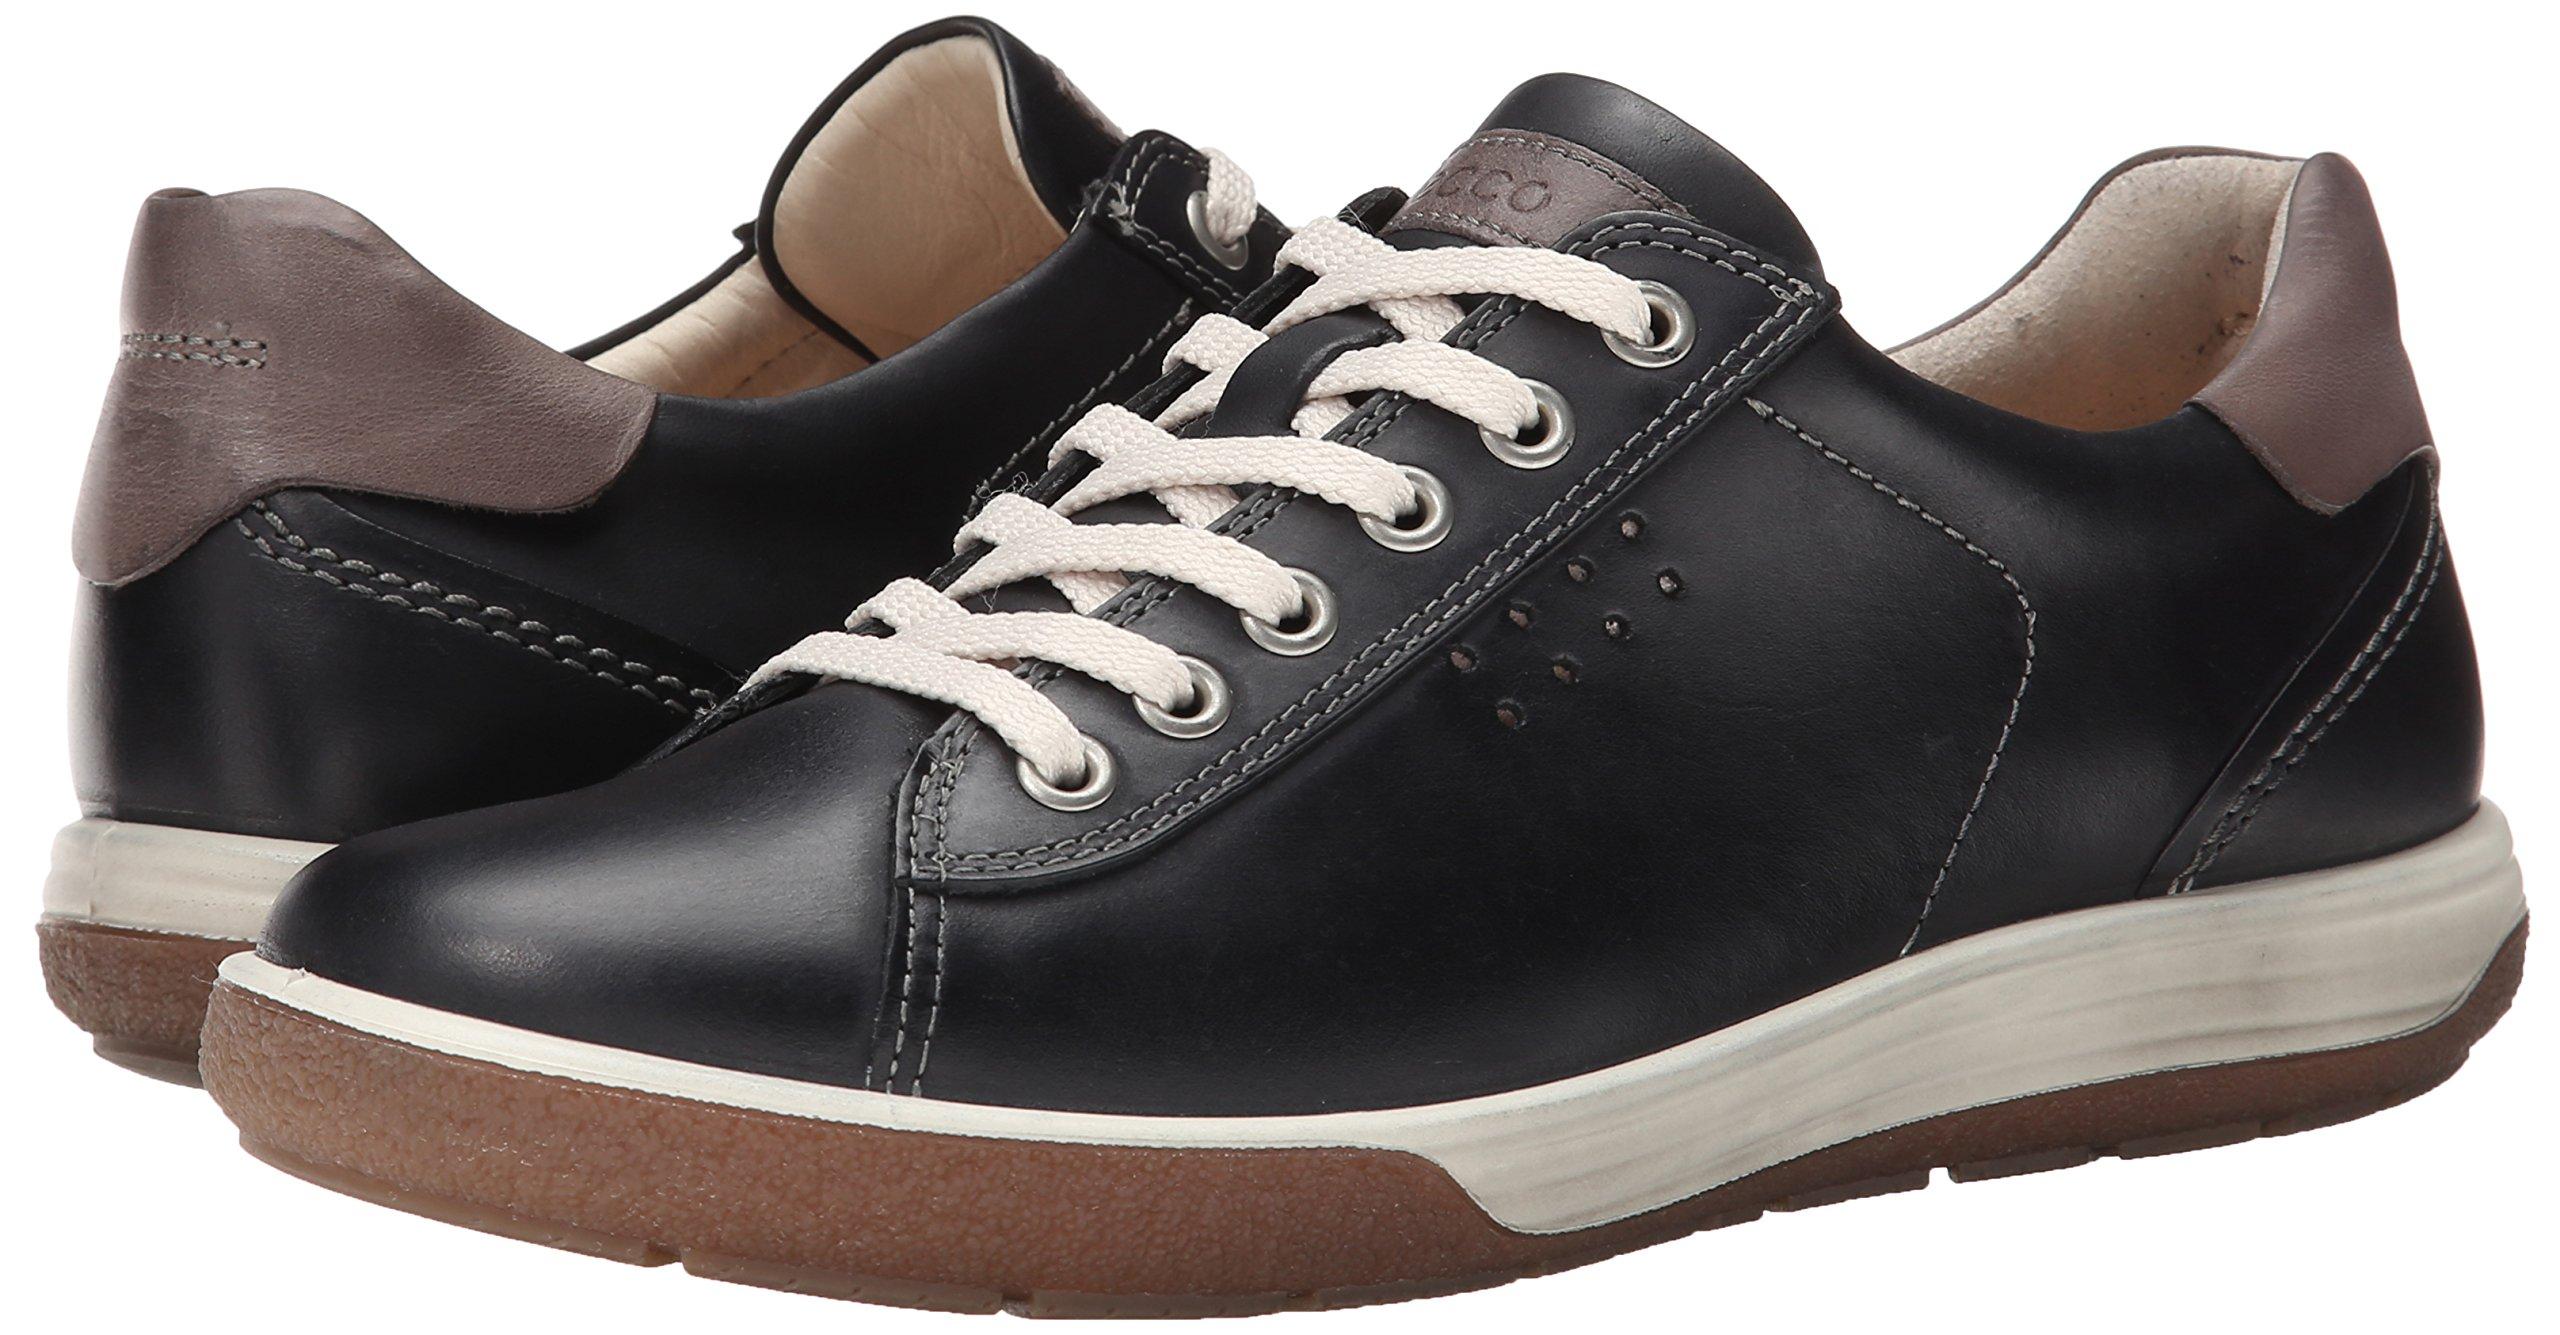 Ecco Footwear Womens Chase II Lace Shoe, Black, 39 EU/8-8.5 M US by ECCO (Image #6)